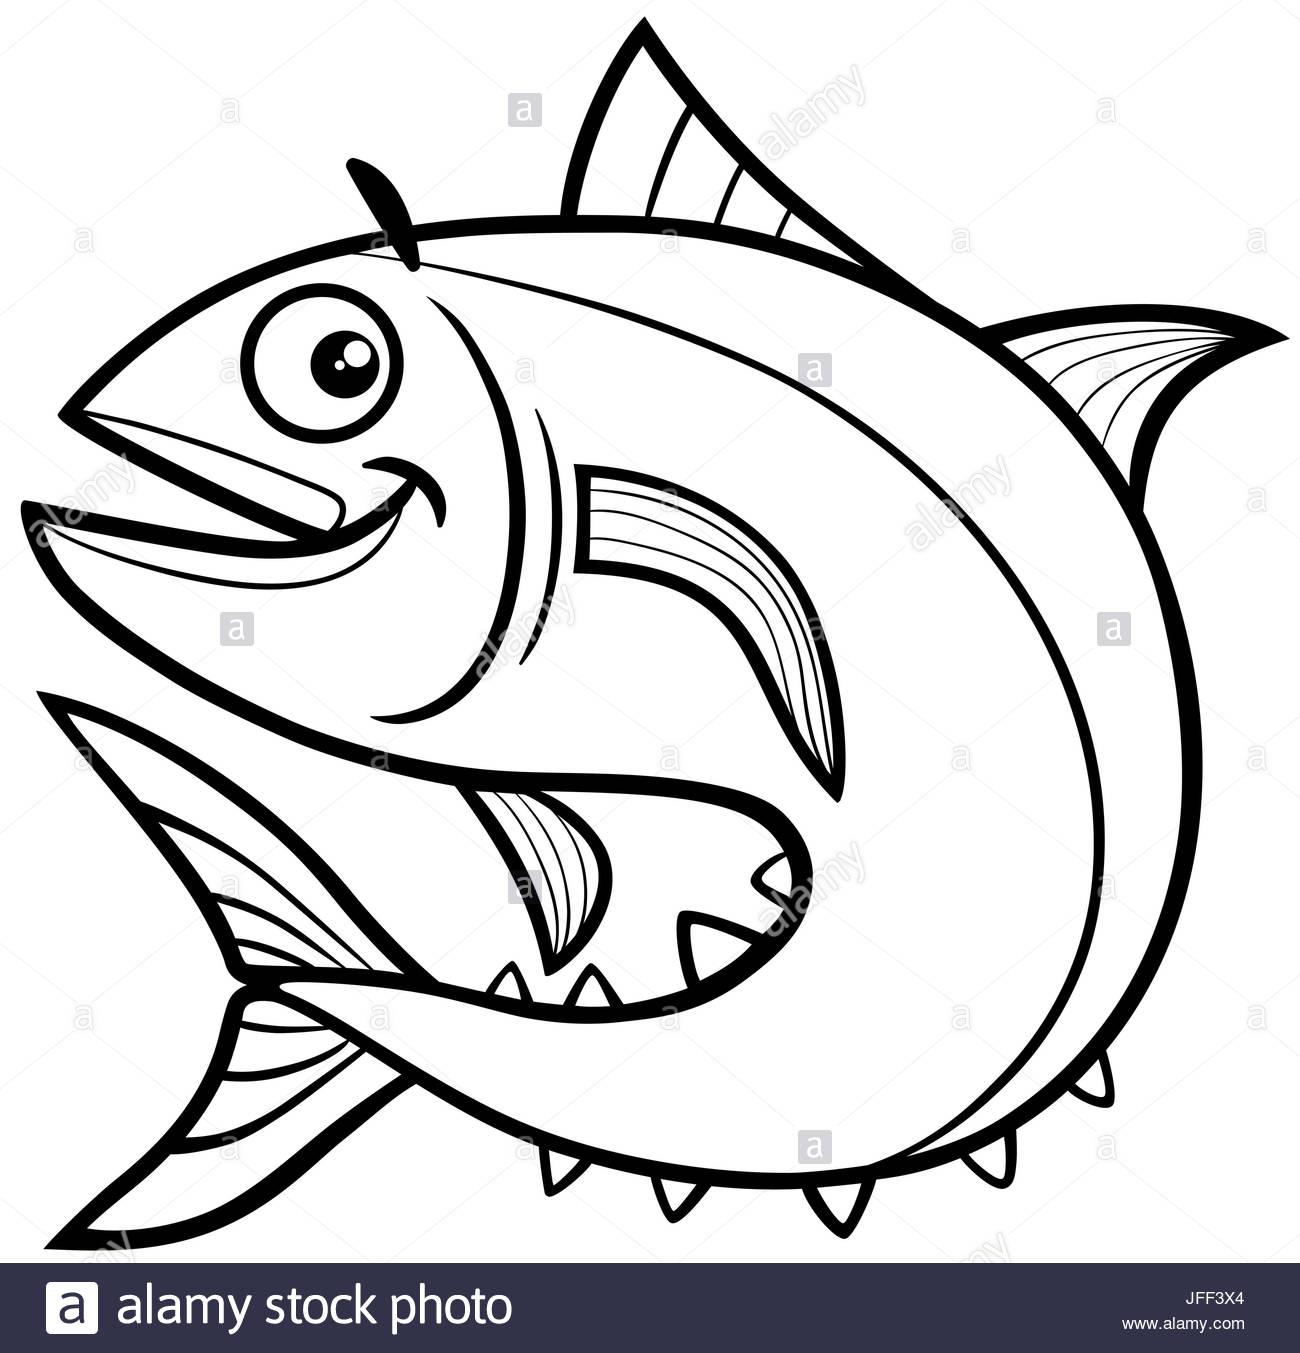 1300x1353 Tuna Fish Coloring Page Stock Photo